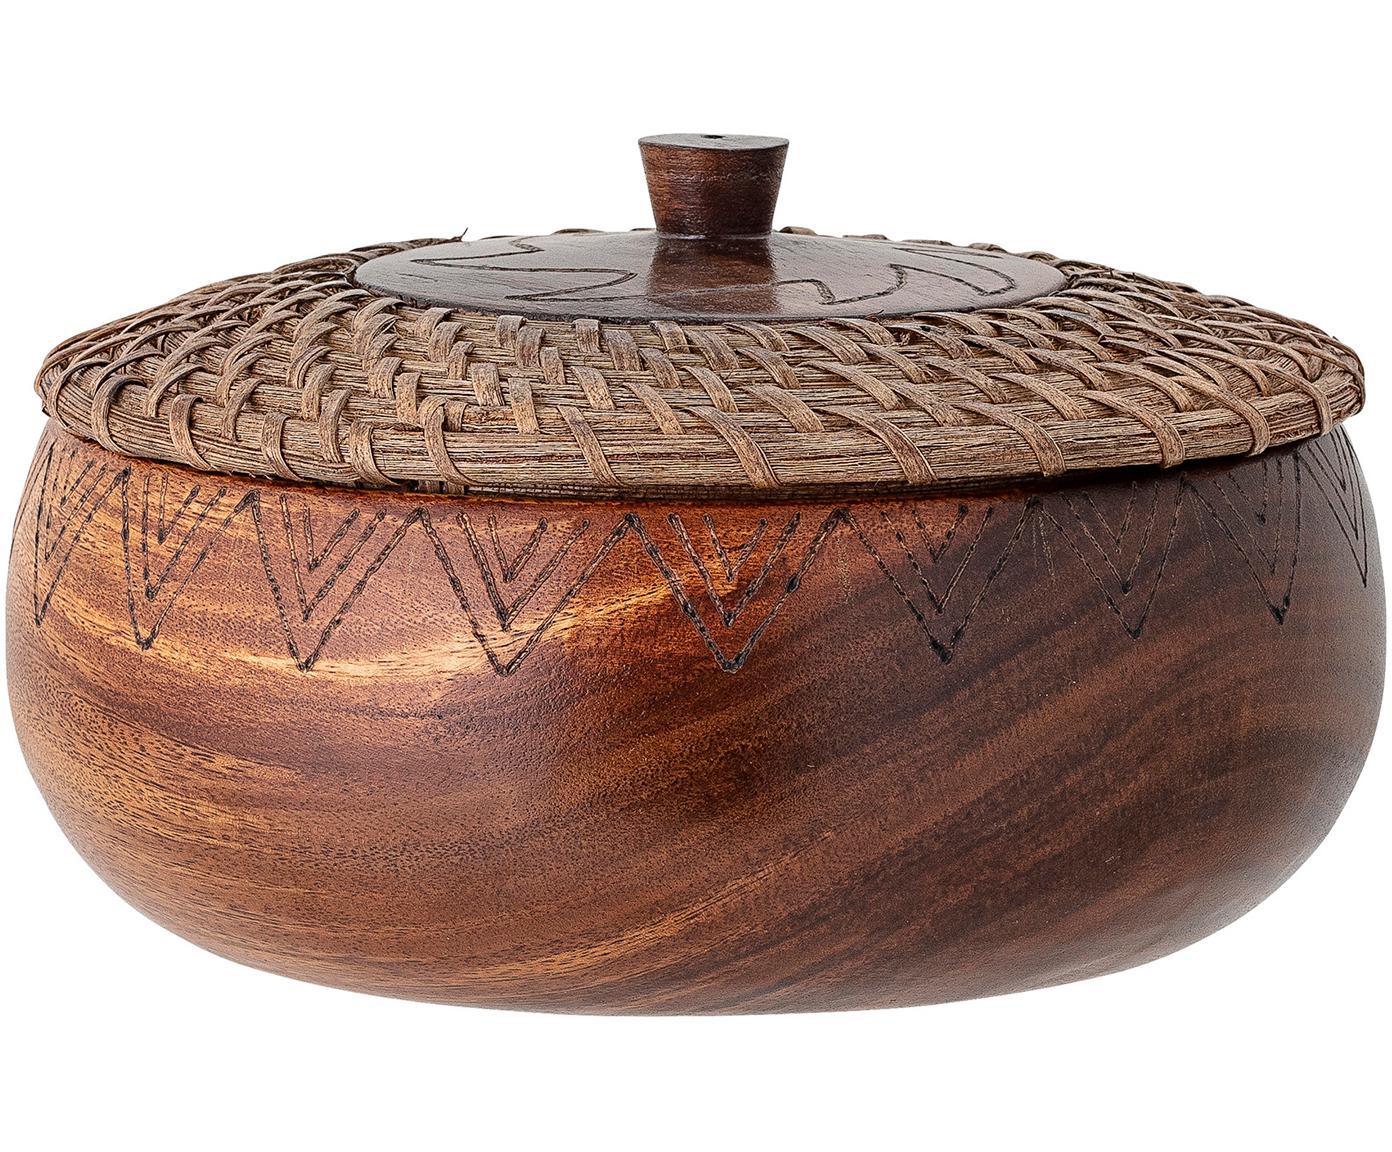 Grosse Schale Femke aus Akazienholz mit Deckel, Ø 24cm, Akazienholz, geölt, Rattan, Braun, Ø 24 cm x H 10 cm